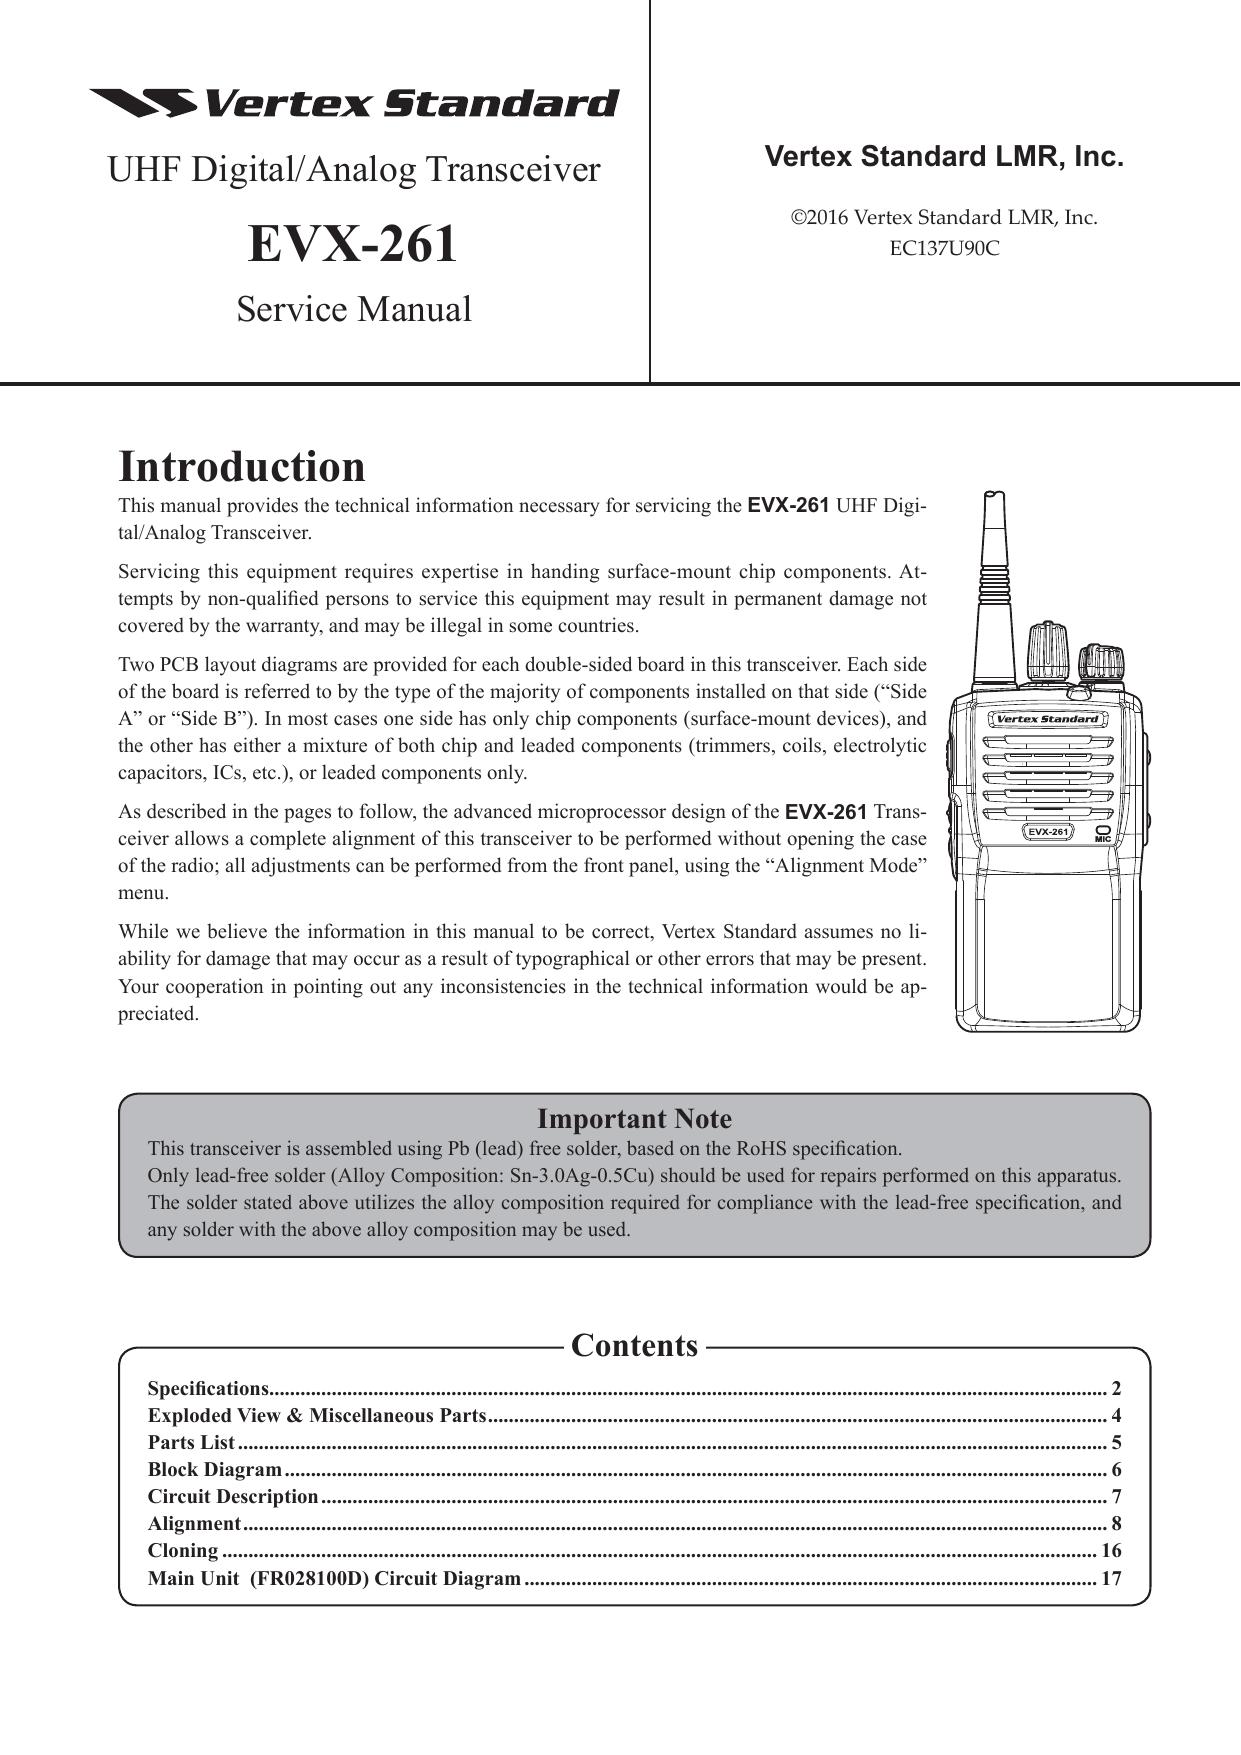 evx 261 radiotronics manualzz com rh manualzz com Residential Electrical Wiring Diagrams Light Switch Wiring Diagram